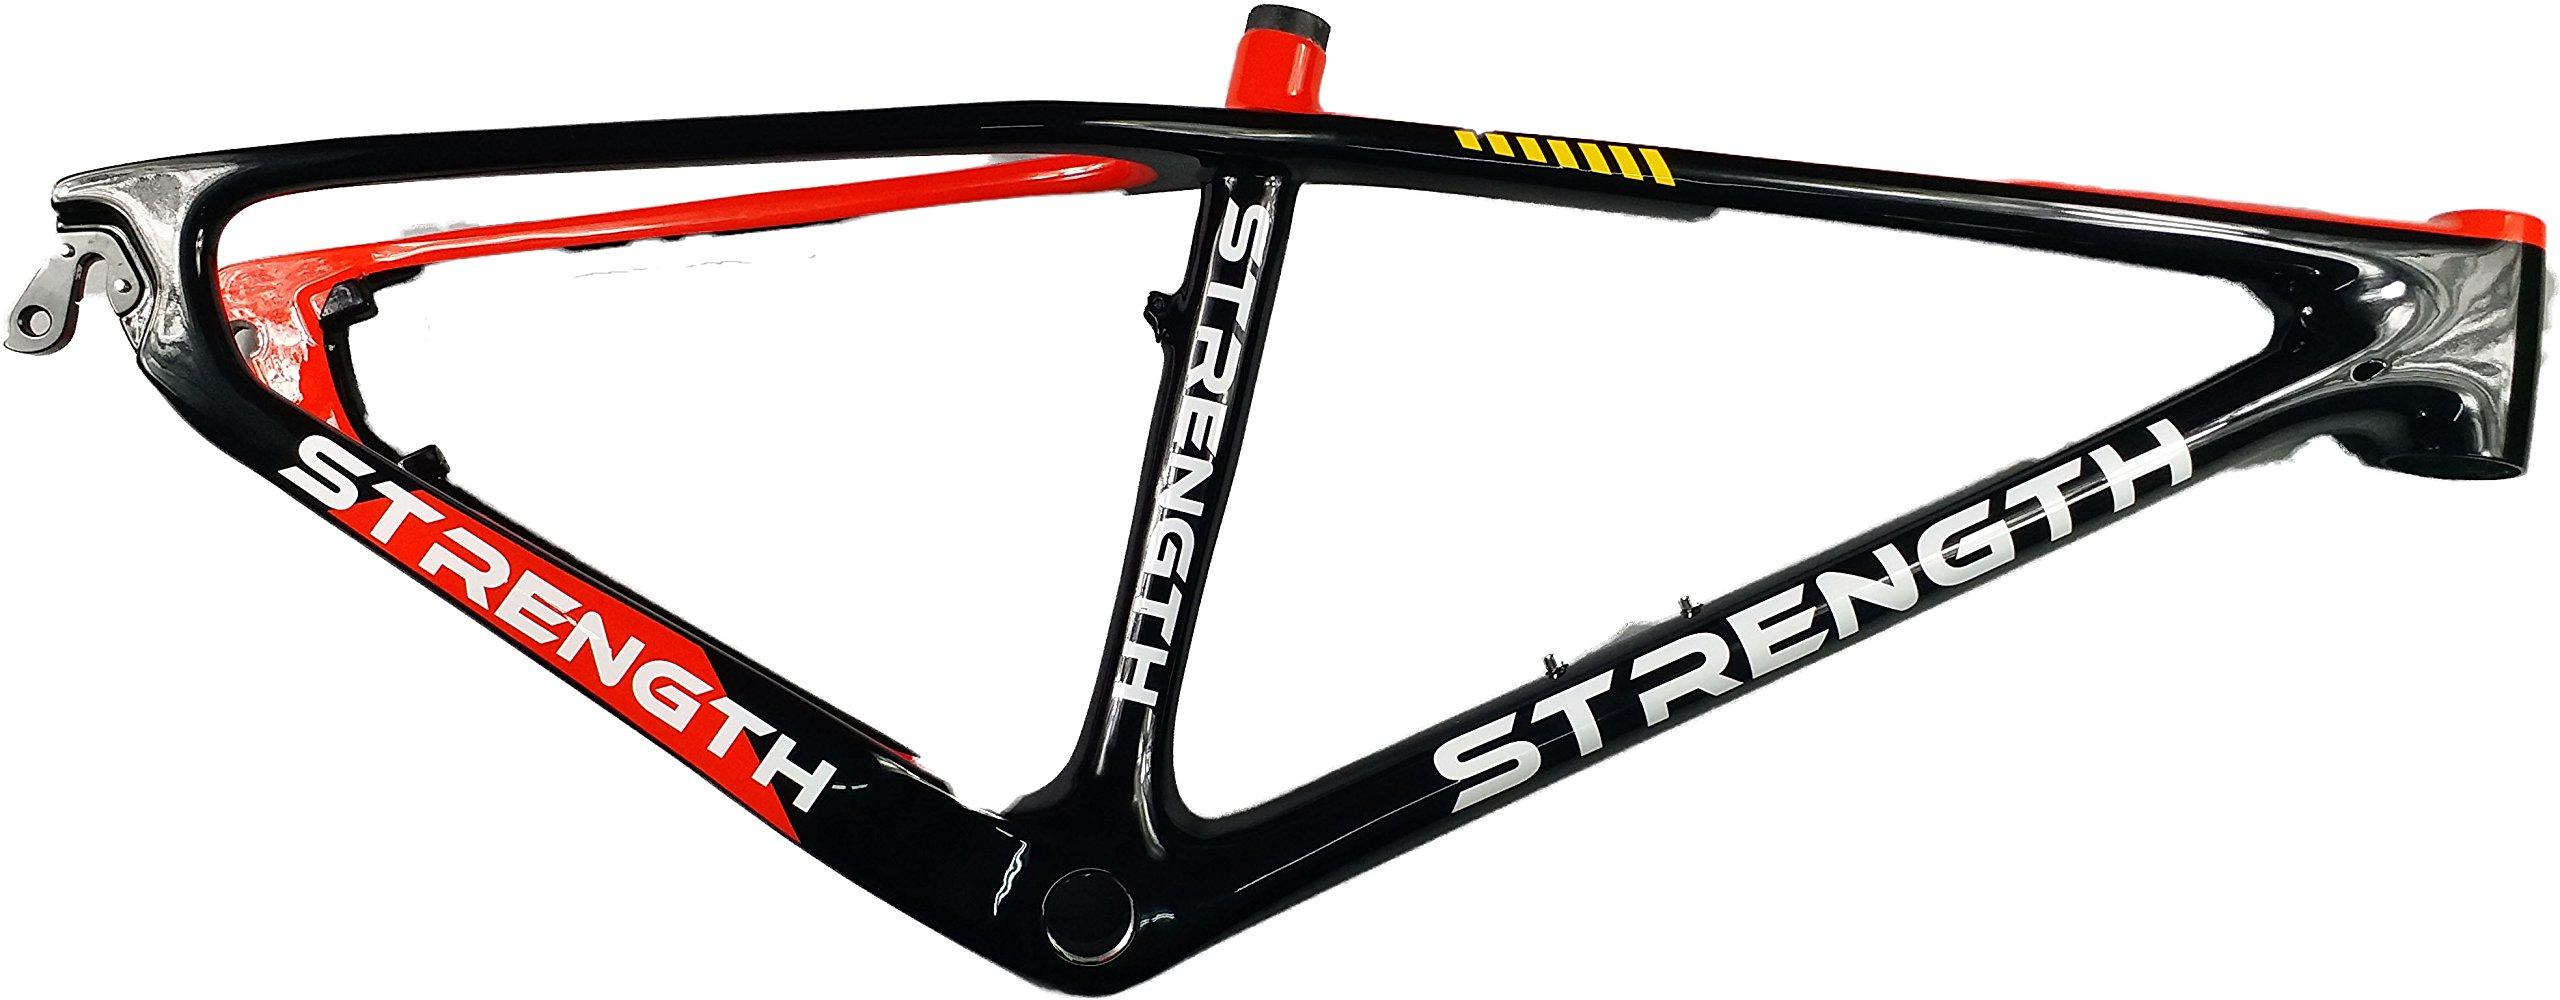 Strength Mountain Bicycle Frame 26ER Bike Frame Carbon Fiber Frame 17'' Red and Black